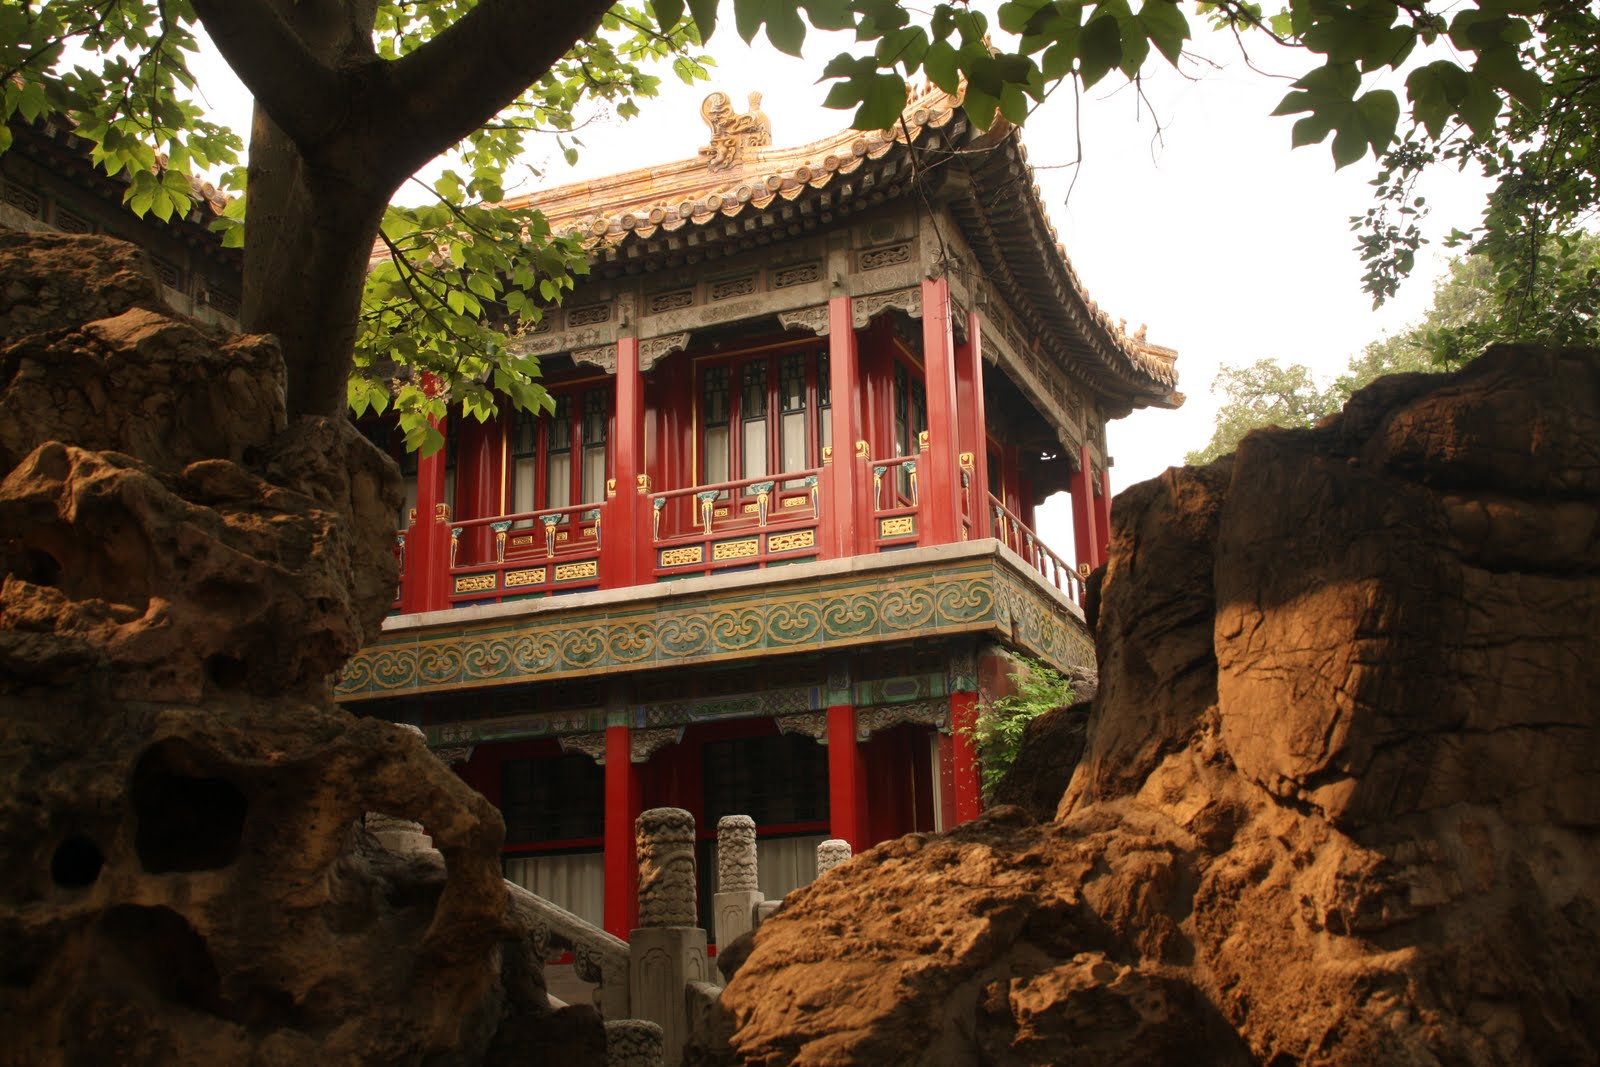 Pekin express for Jardin imperial chino